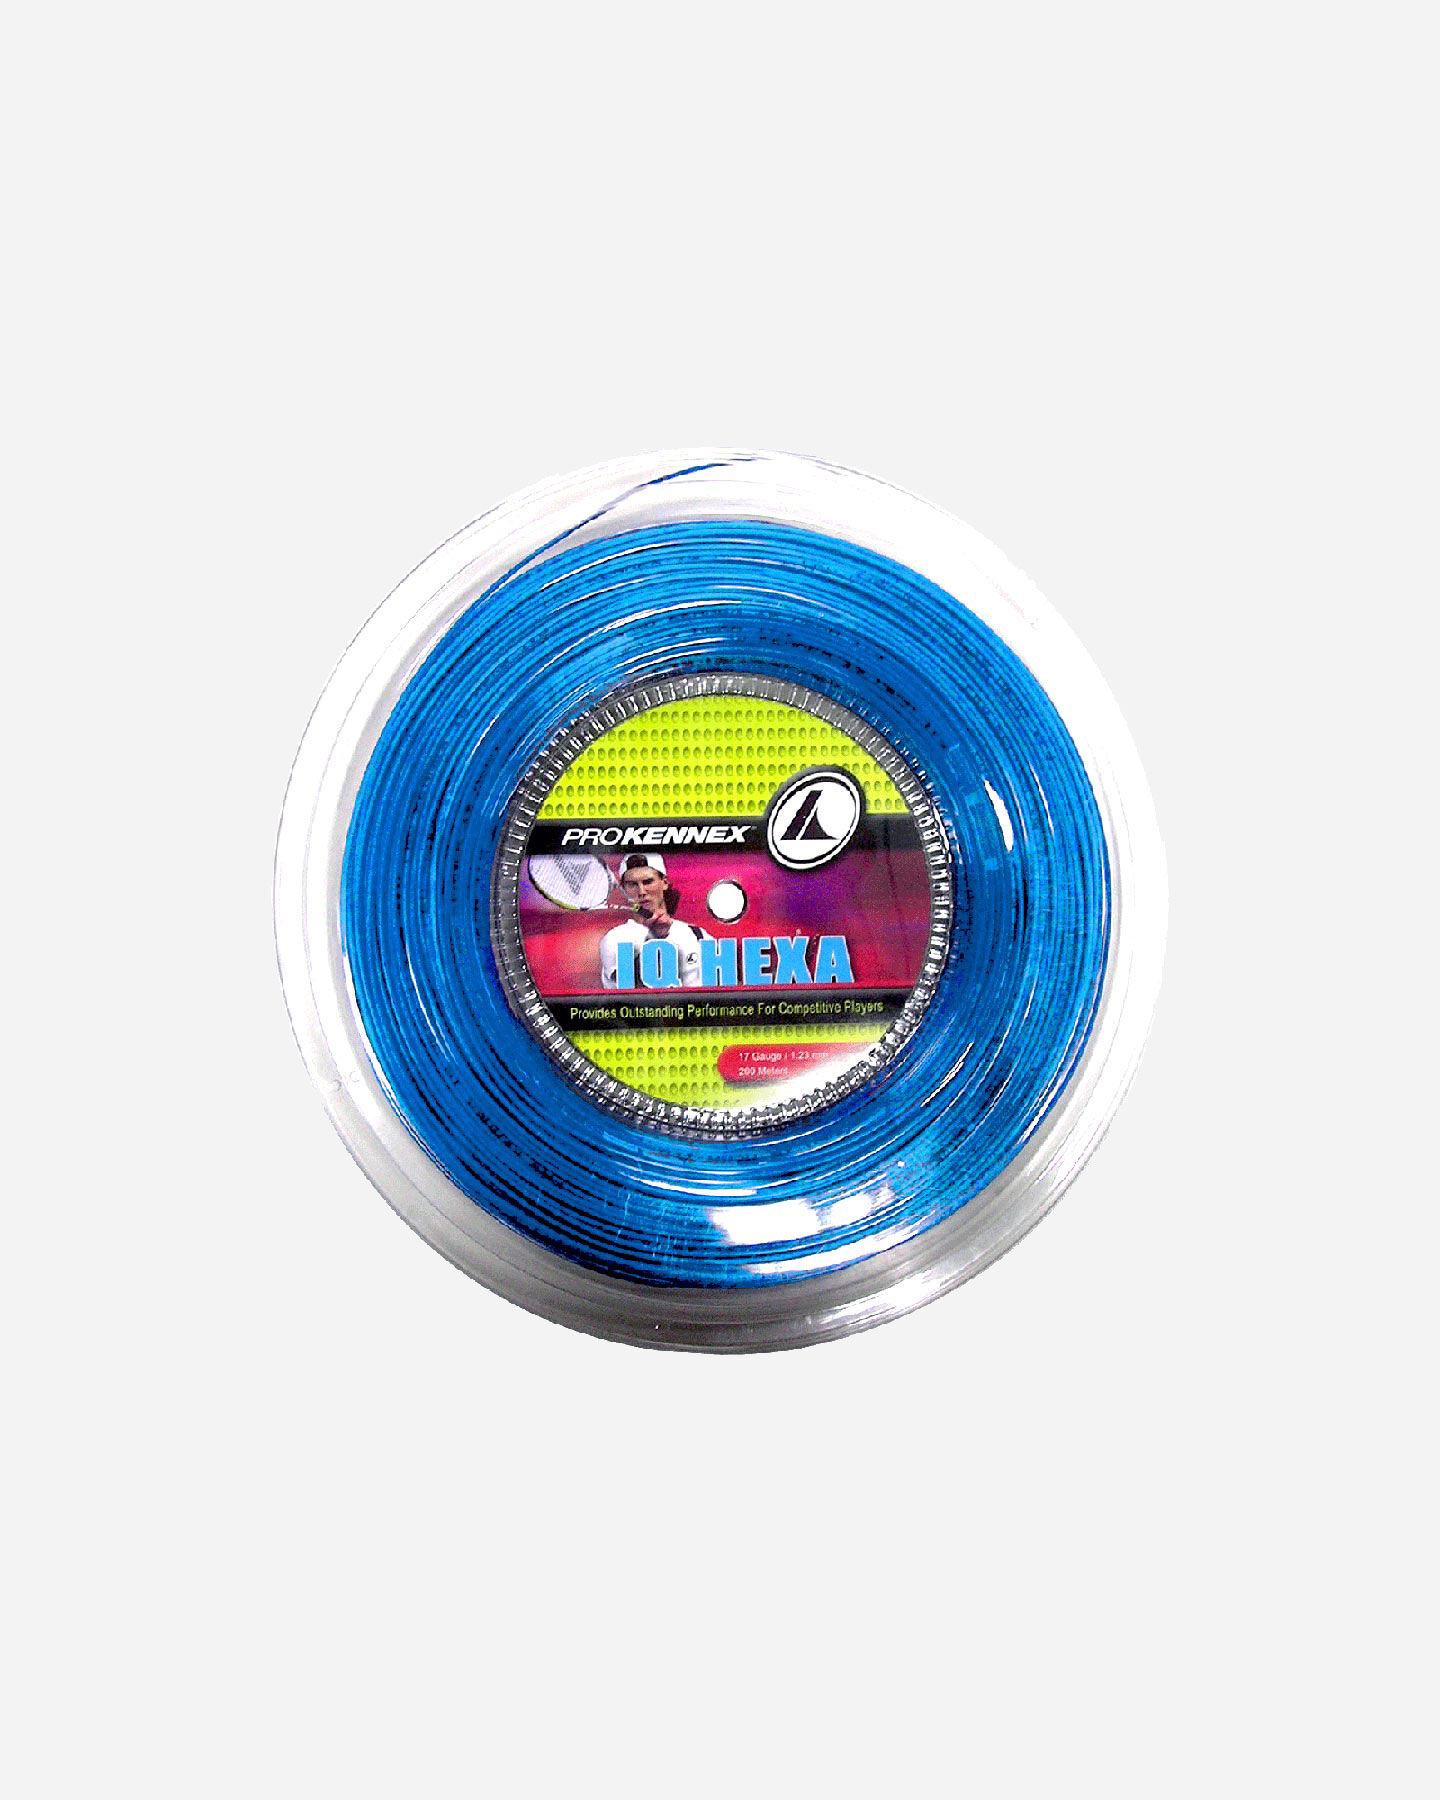 Corde tennis PRO KENNEX IQ HEXA 200 MT S1227686|9999|UNI scatto 0